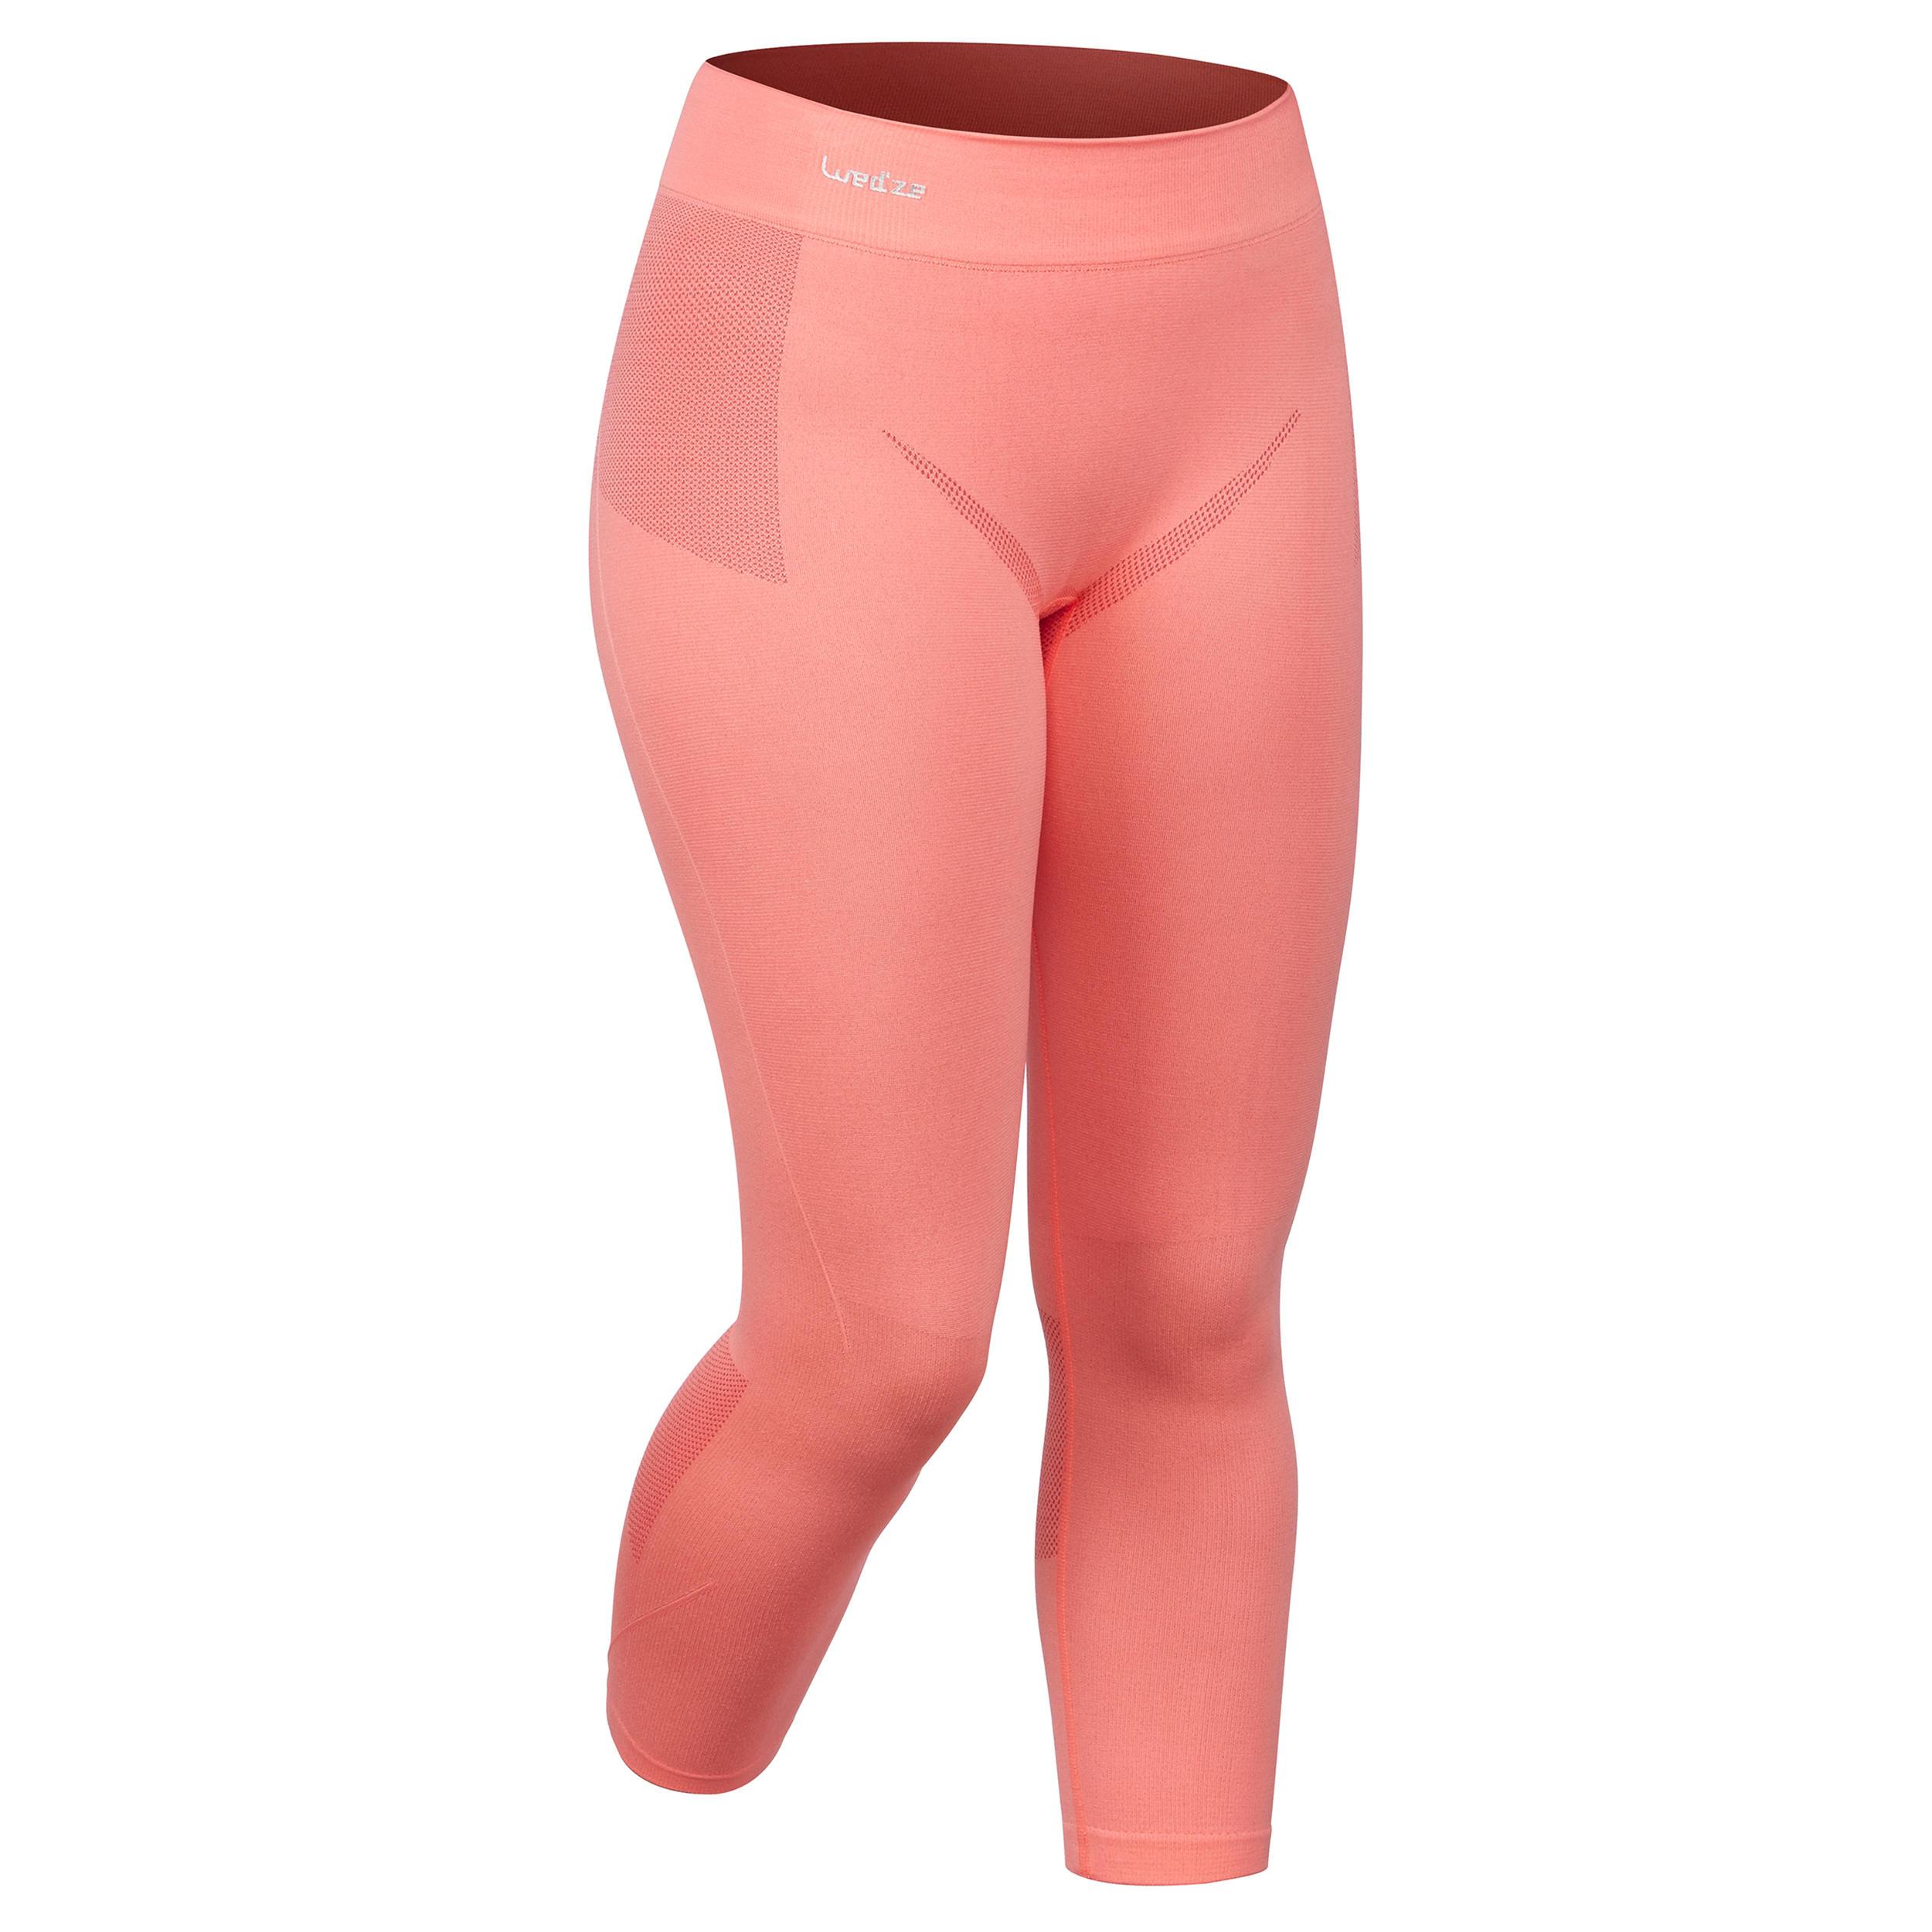 Skiunterwäsche Funktionshose 900 Damen rosa | Sportbekleidung > Funktionswäsche | Rot - Rosa | Wed'ze